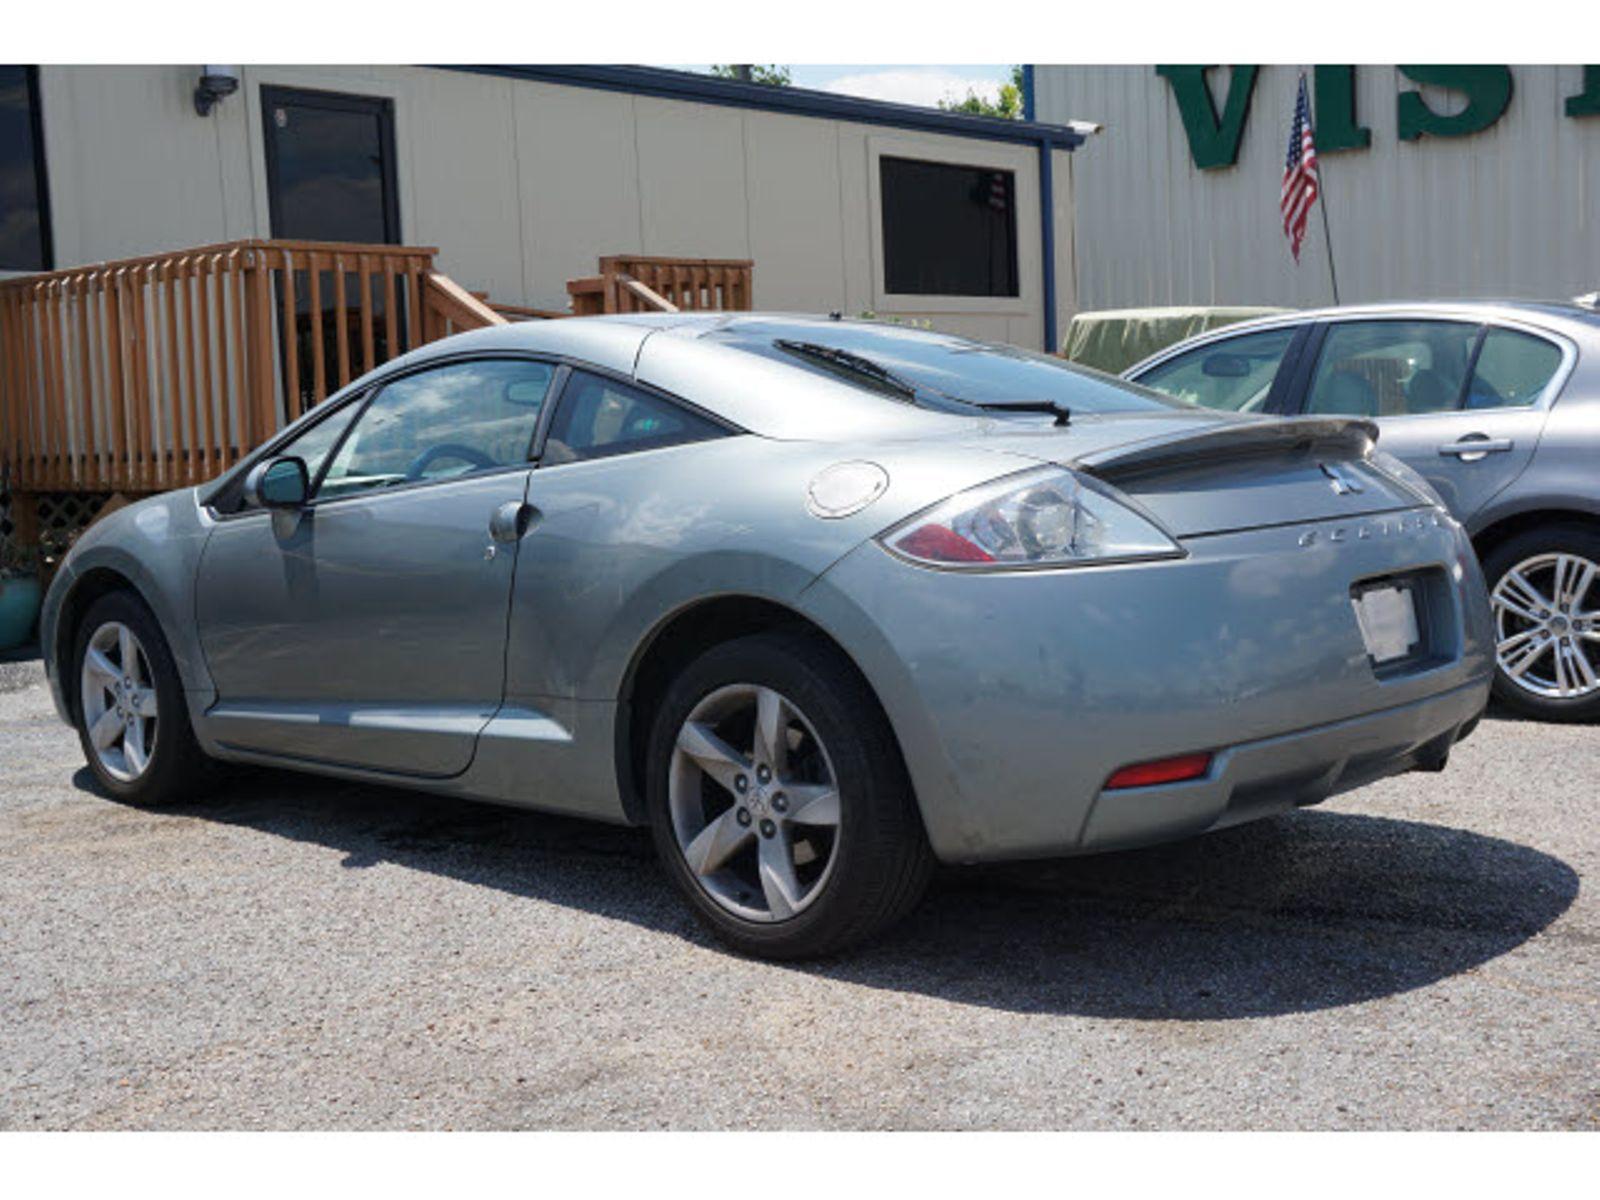 ... 2007 Mitsubishi Eclipse GT City Texas Vista Cars And Trucks In Houston,  Texas ...